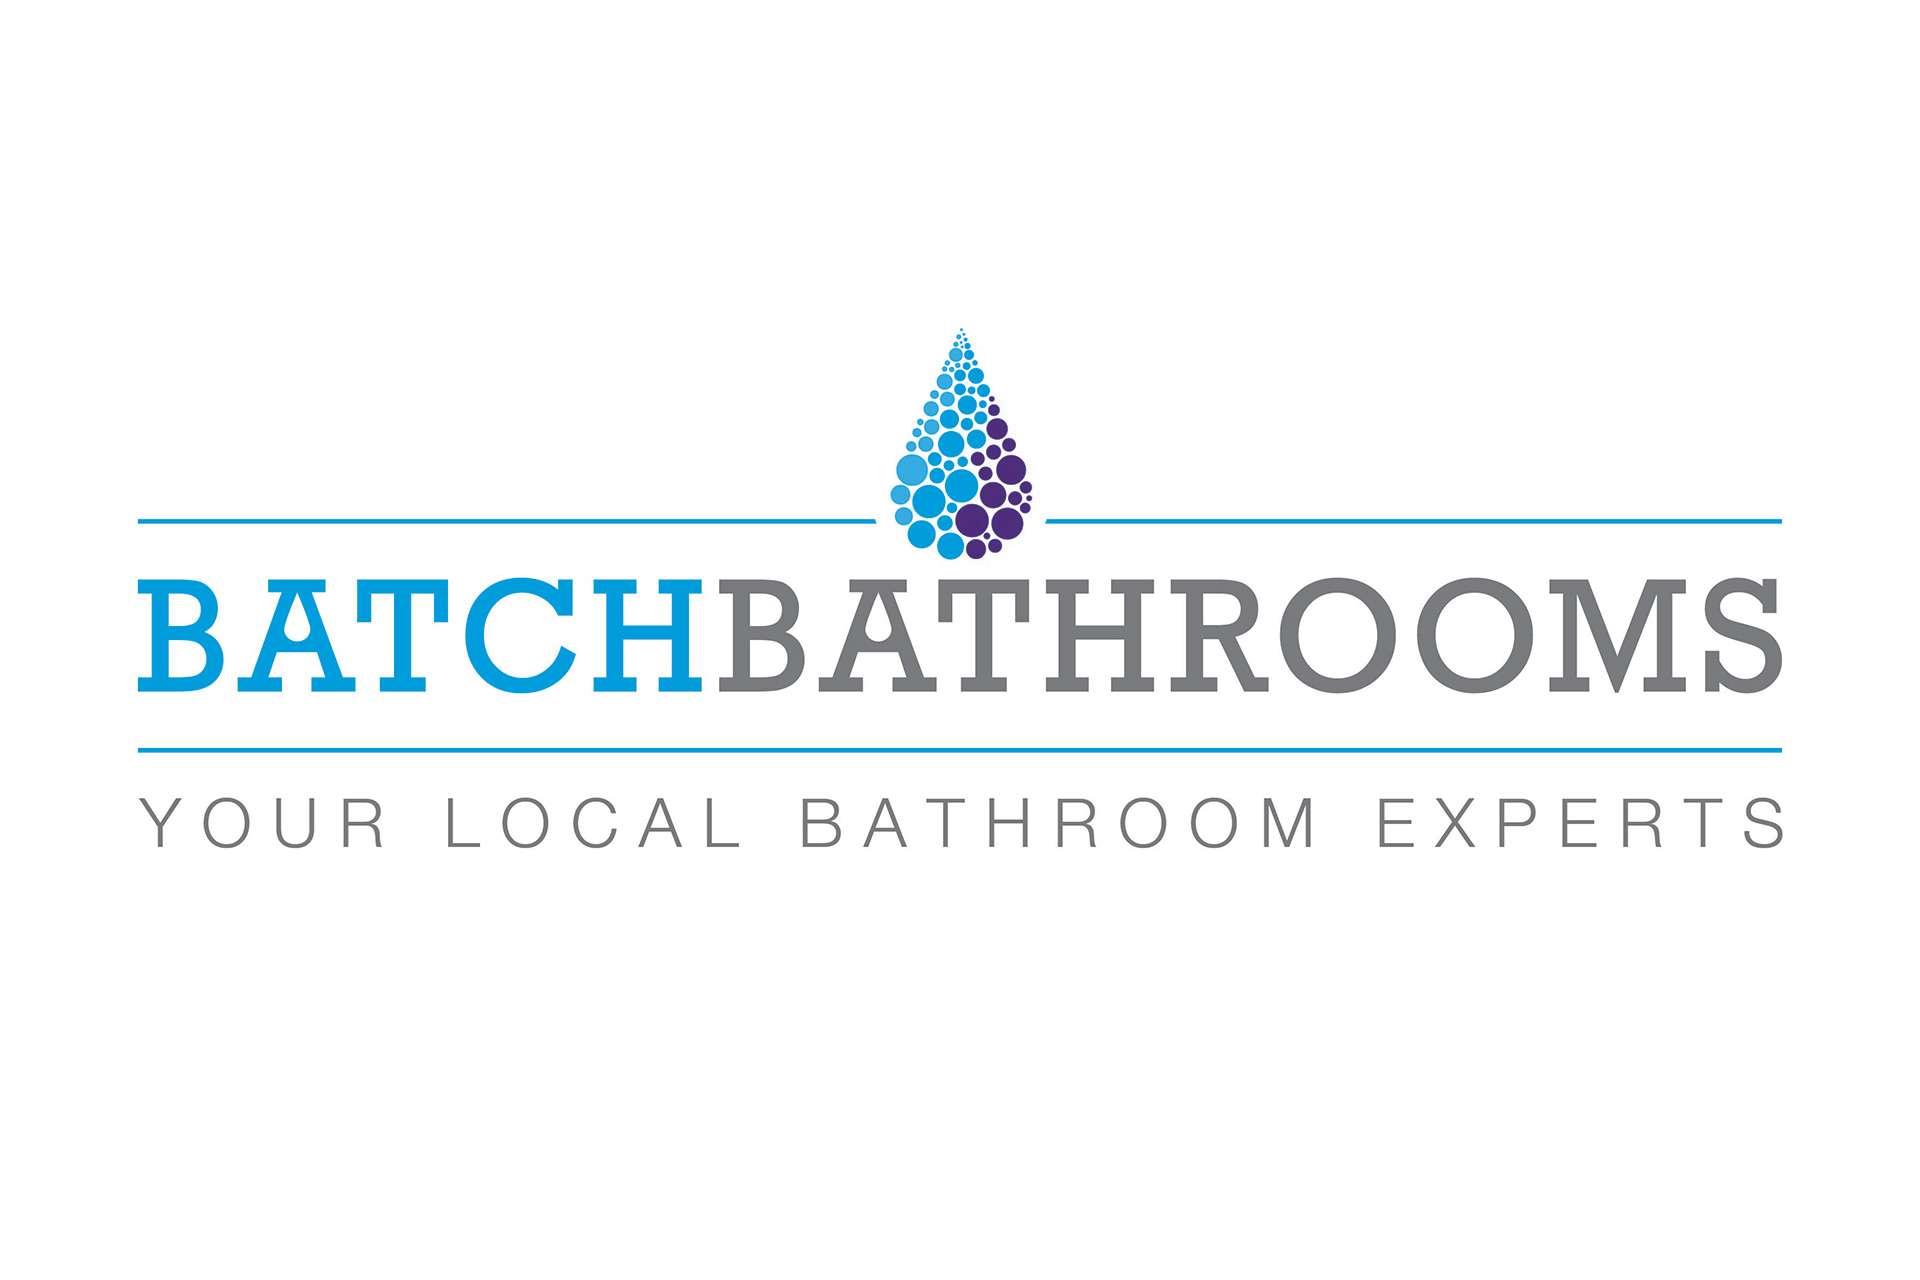 Batch Bathrooms Logo and Graphic design Burnham-on-Sea, Somerset